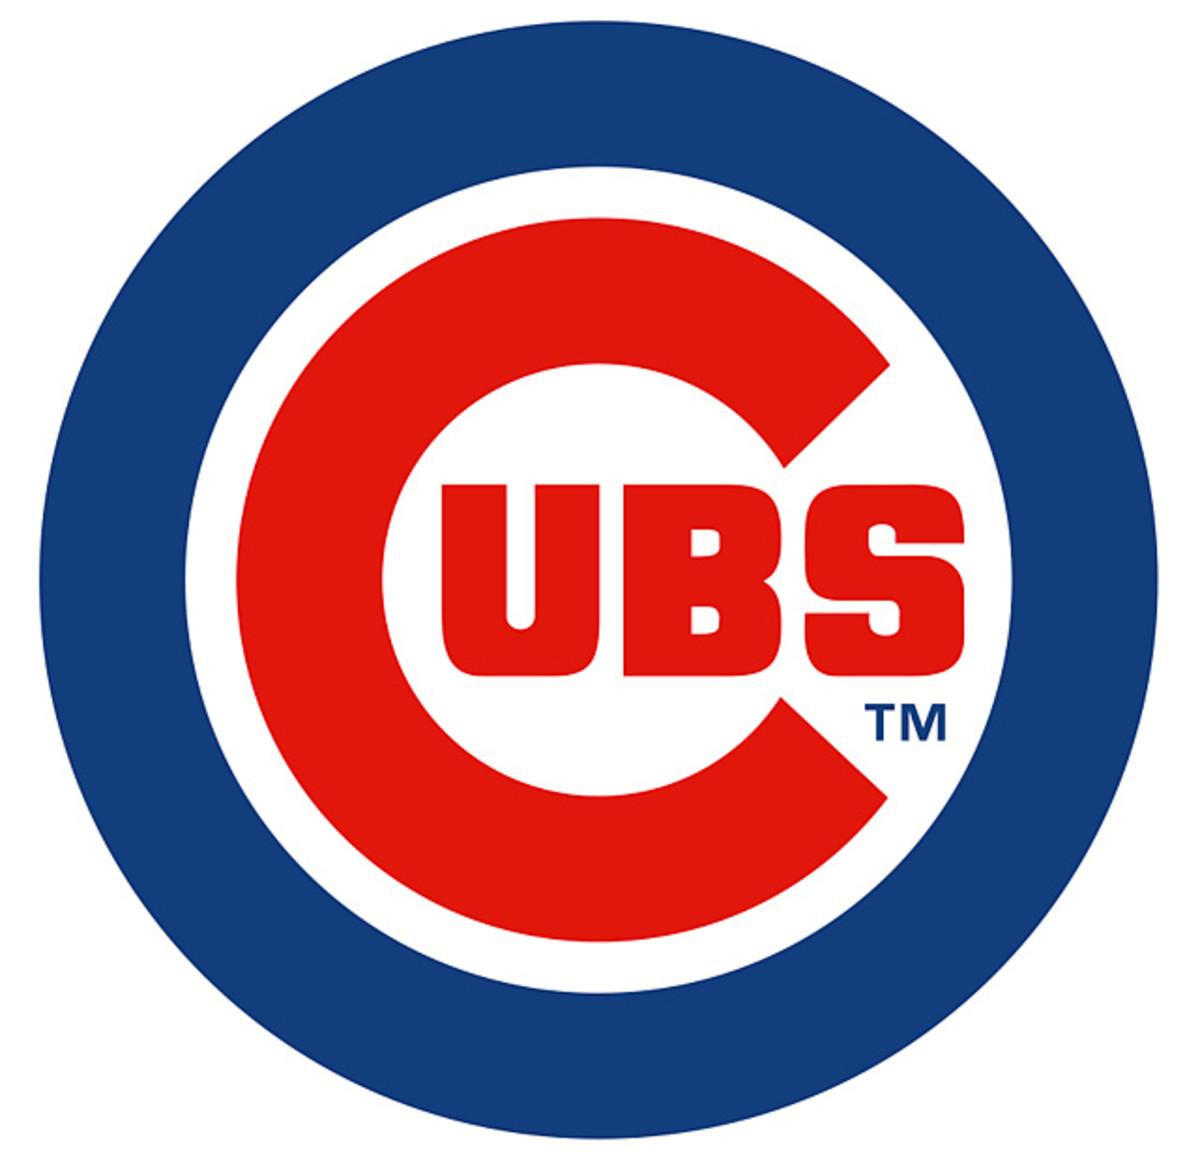 131011163211-030413-chicago-cubs-logo-single-image-cut.jpg